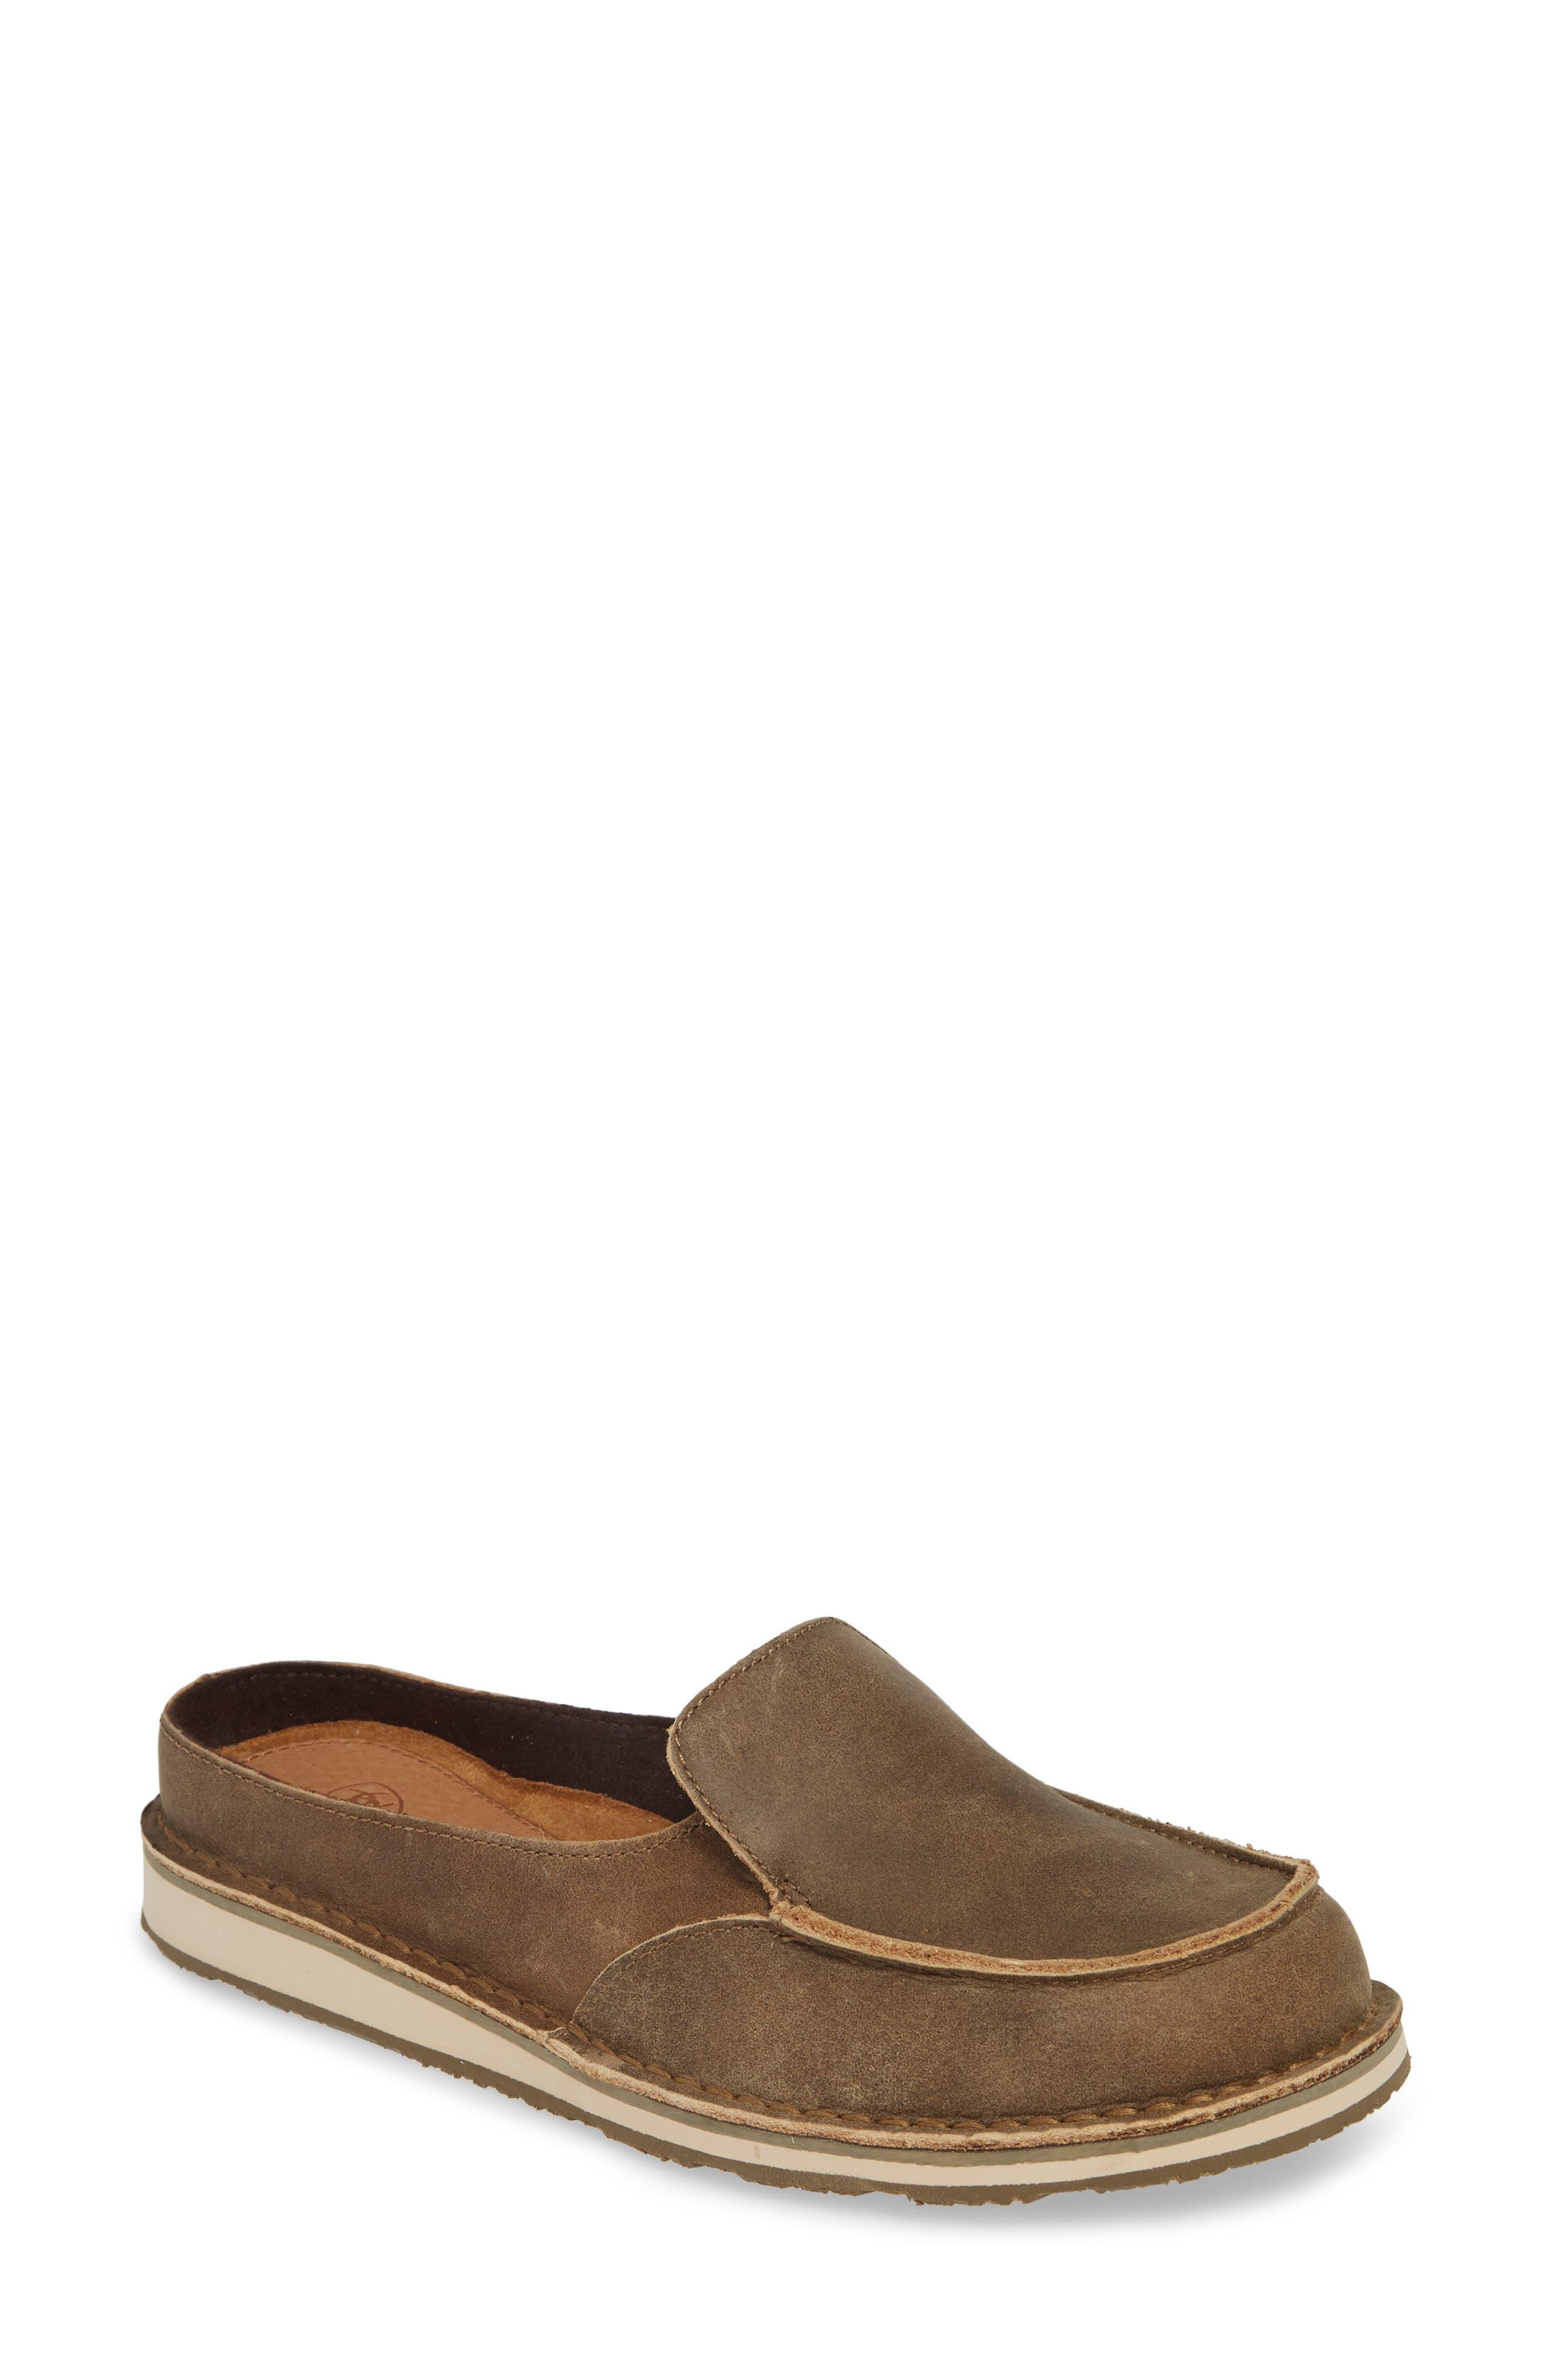 Ariat Cruiser Loafer Mule, Brown